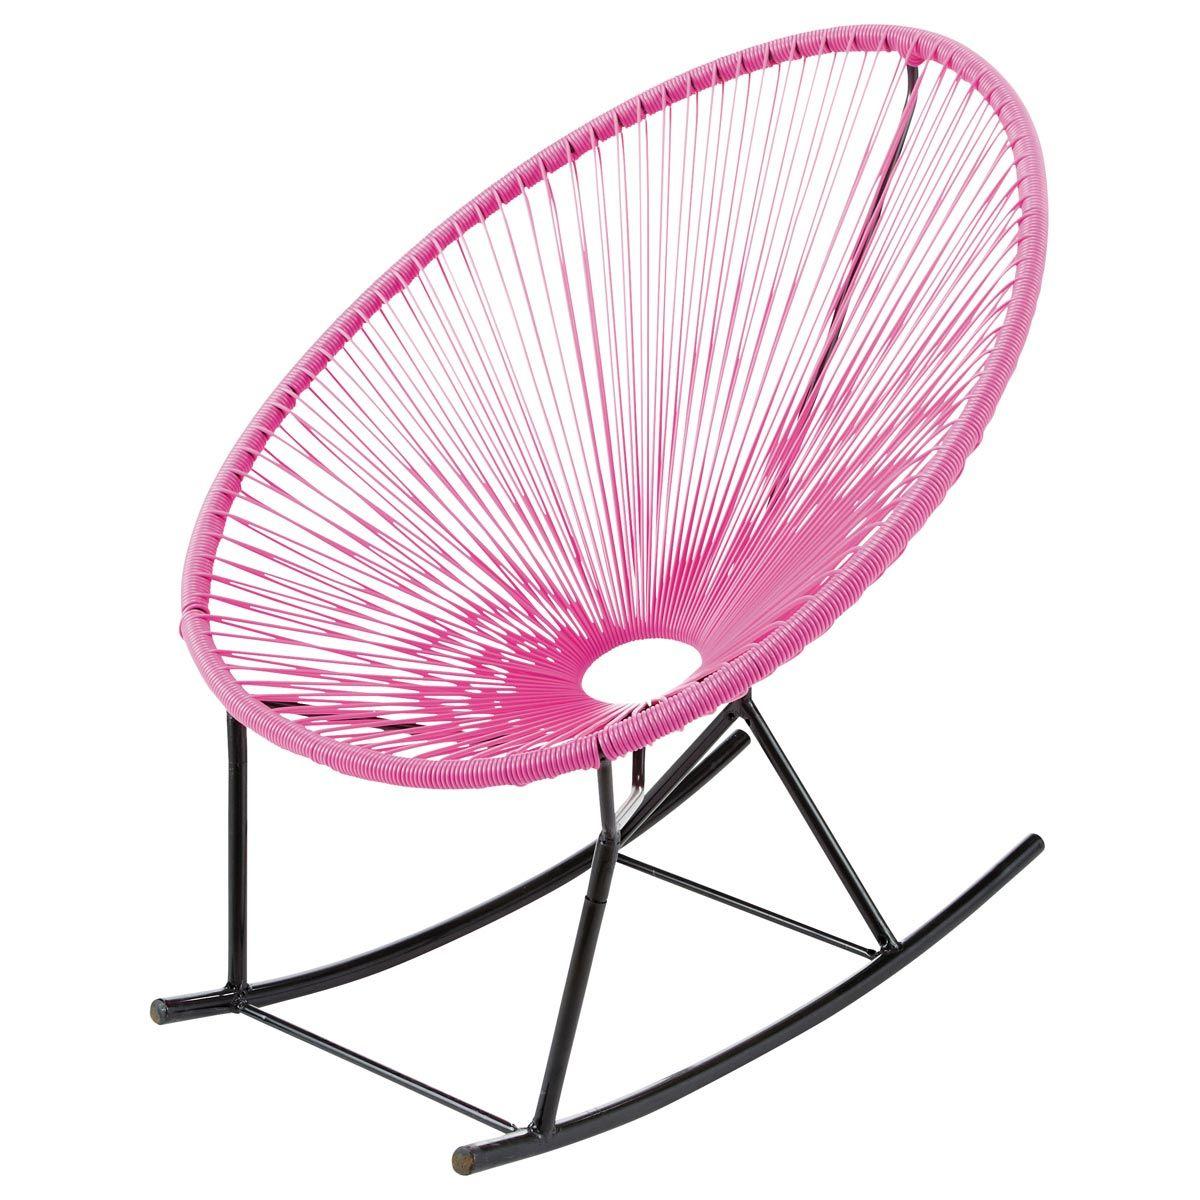 Fauteuil À Bascule De Jardin Rosebr /copacabana   Mexican ... serapportantà Rocking Chair Jardin